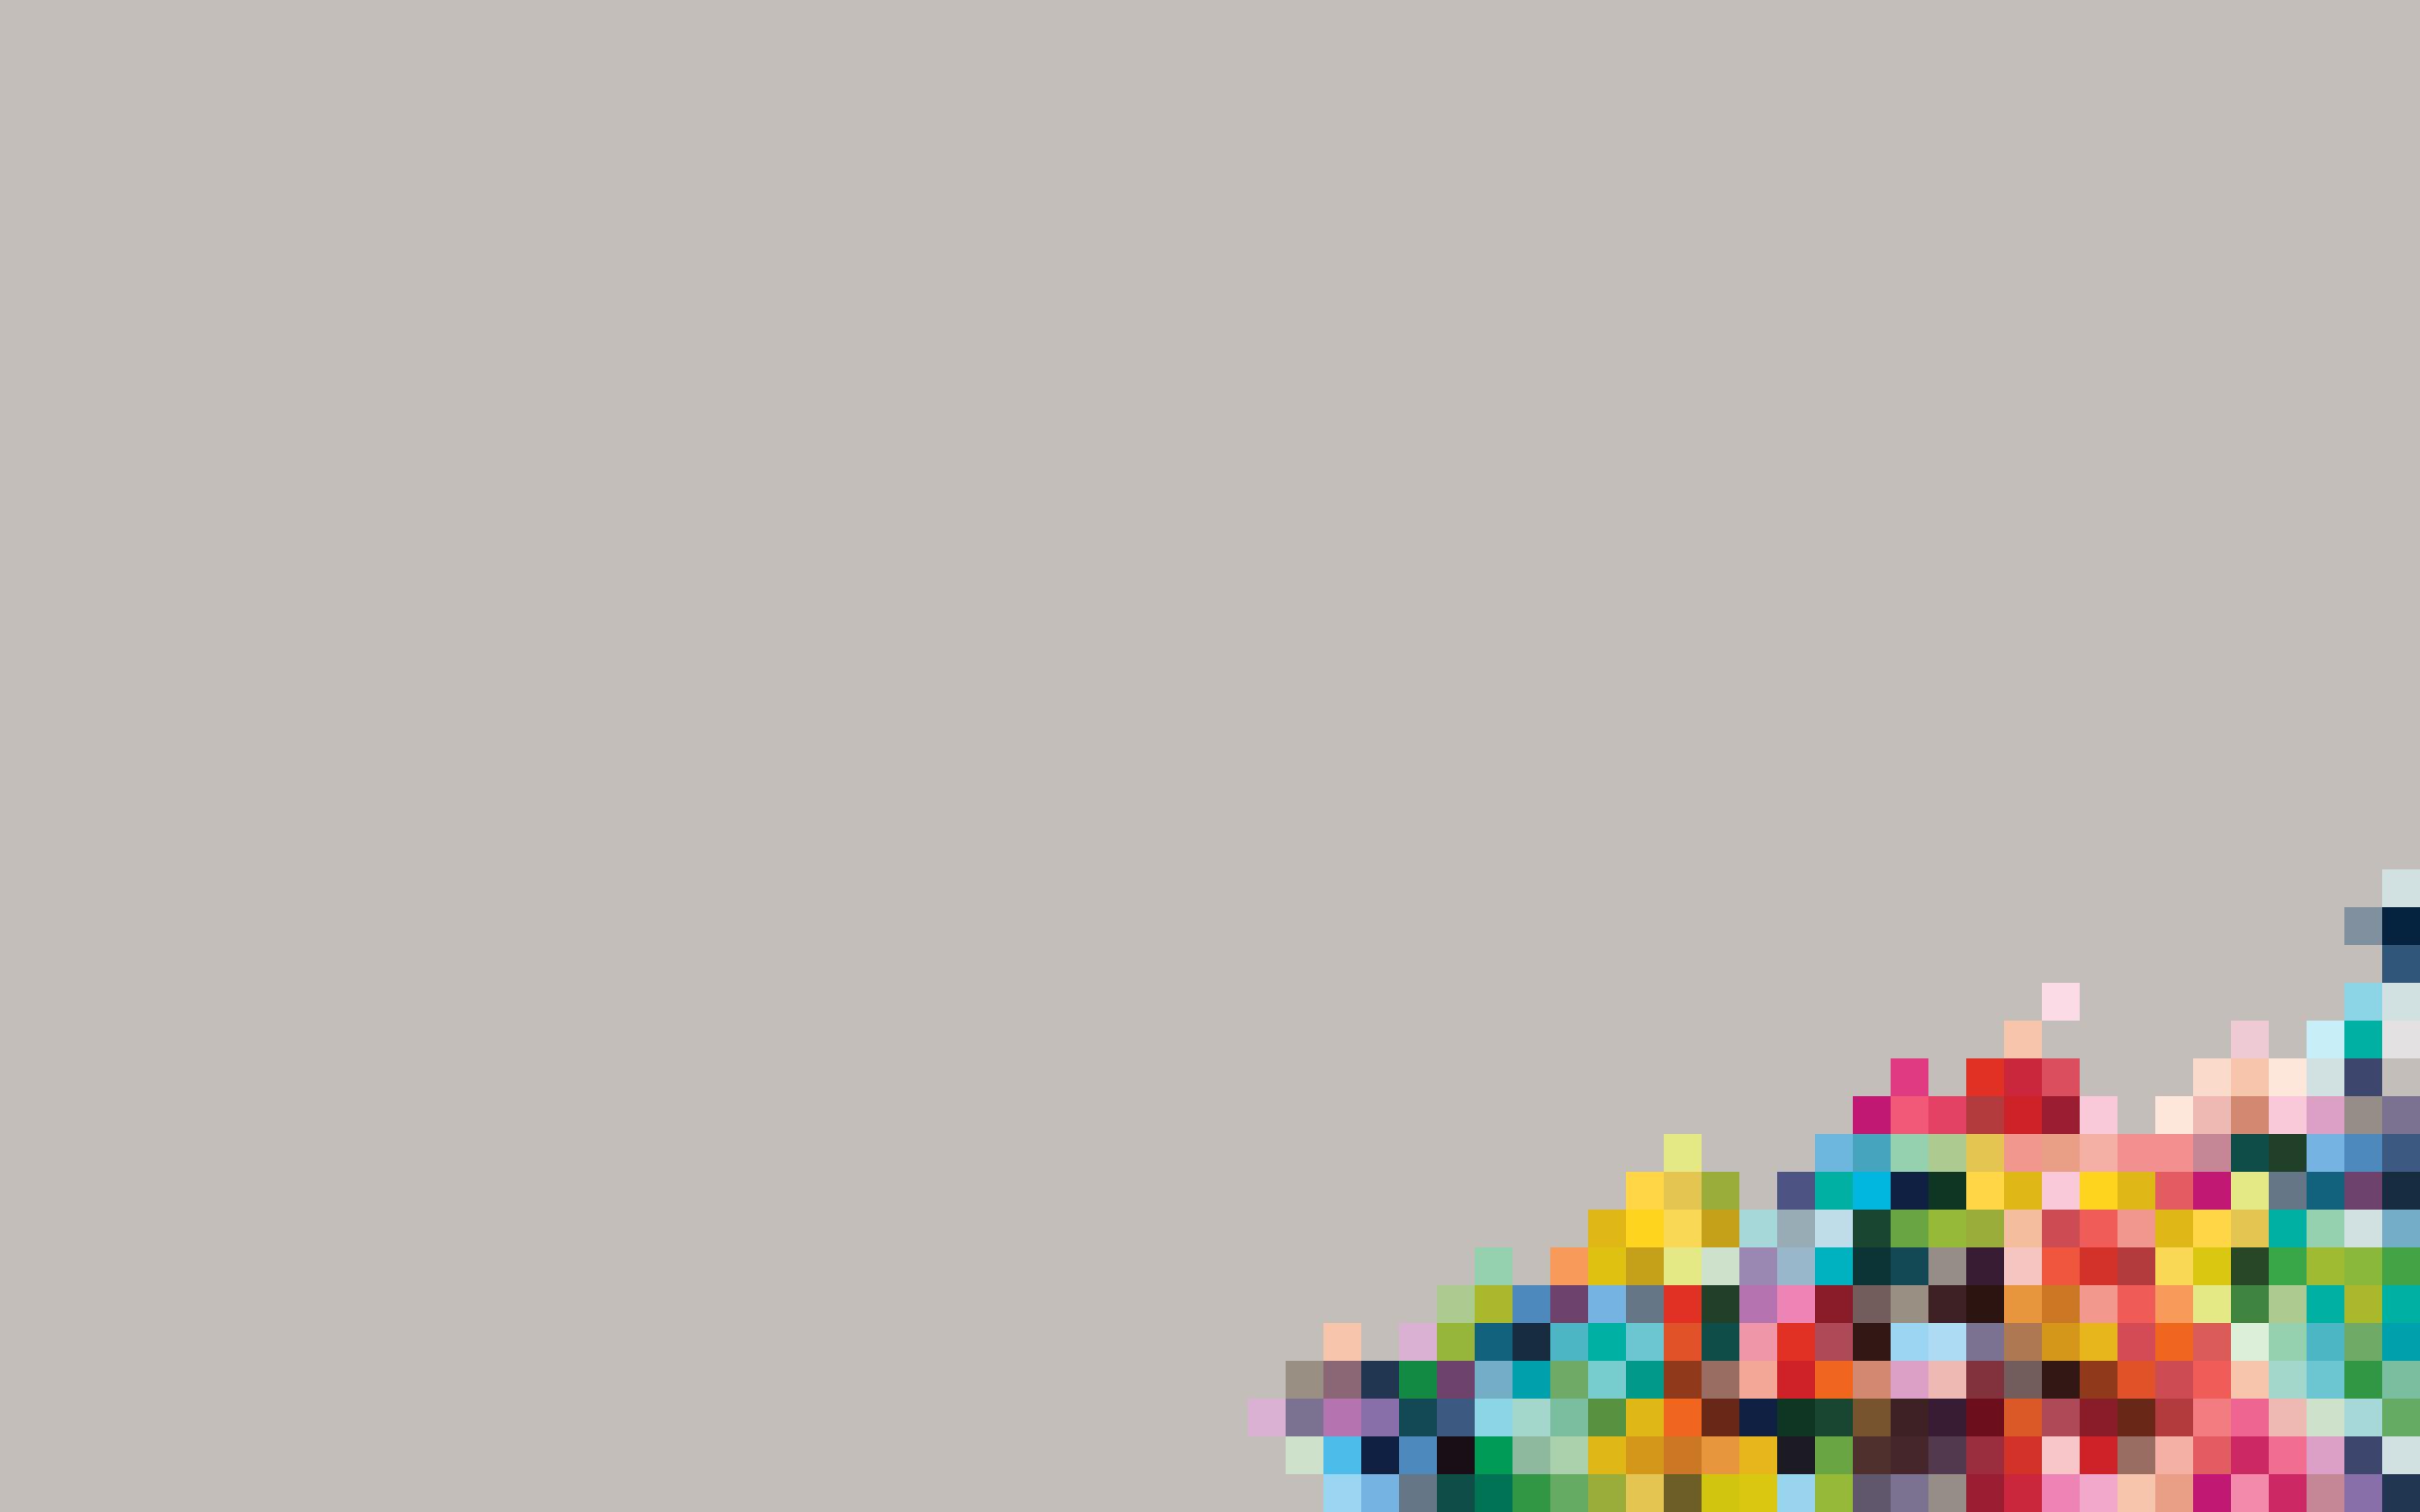 desktop background size pixels fresh pixel 37729 2560x1600 px hdwallsource com